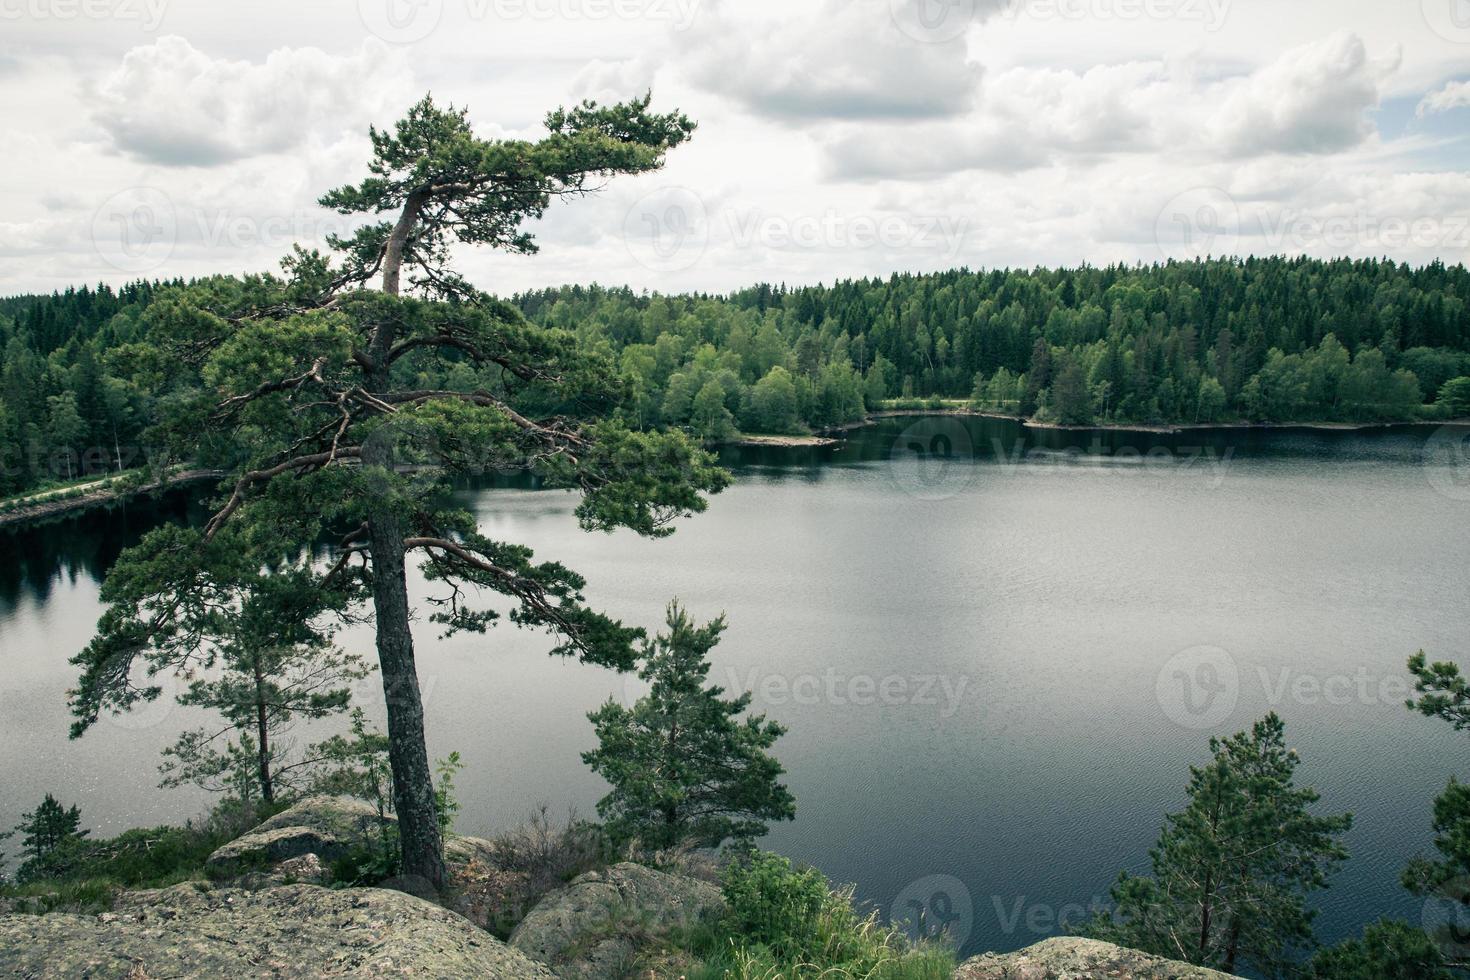 vista lago svedese foto